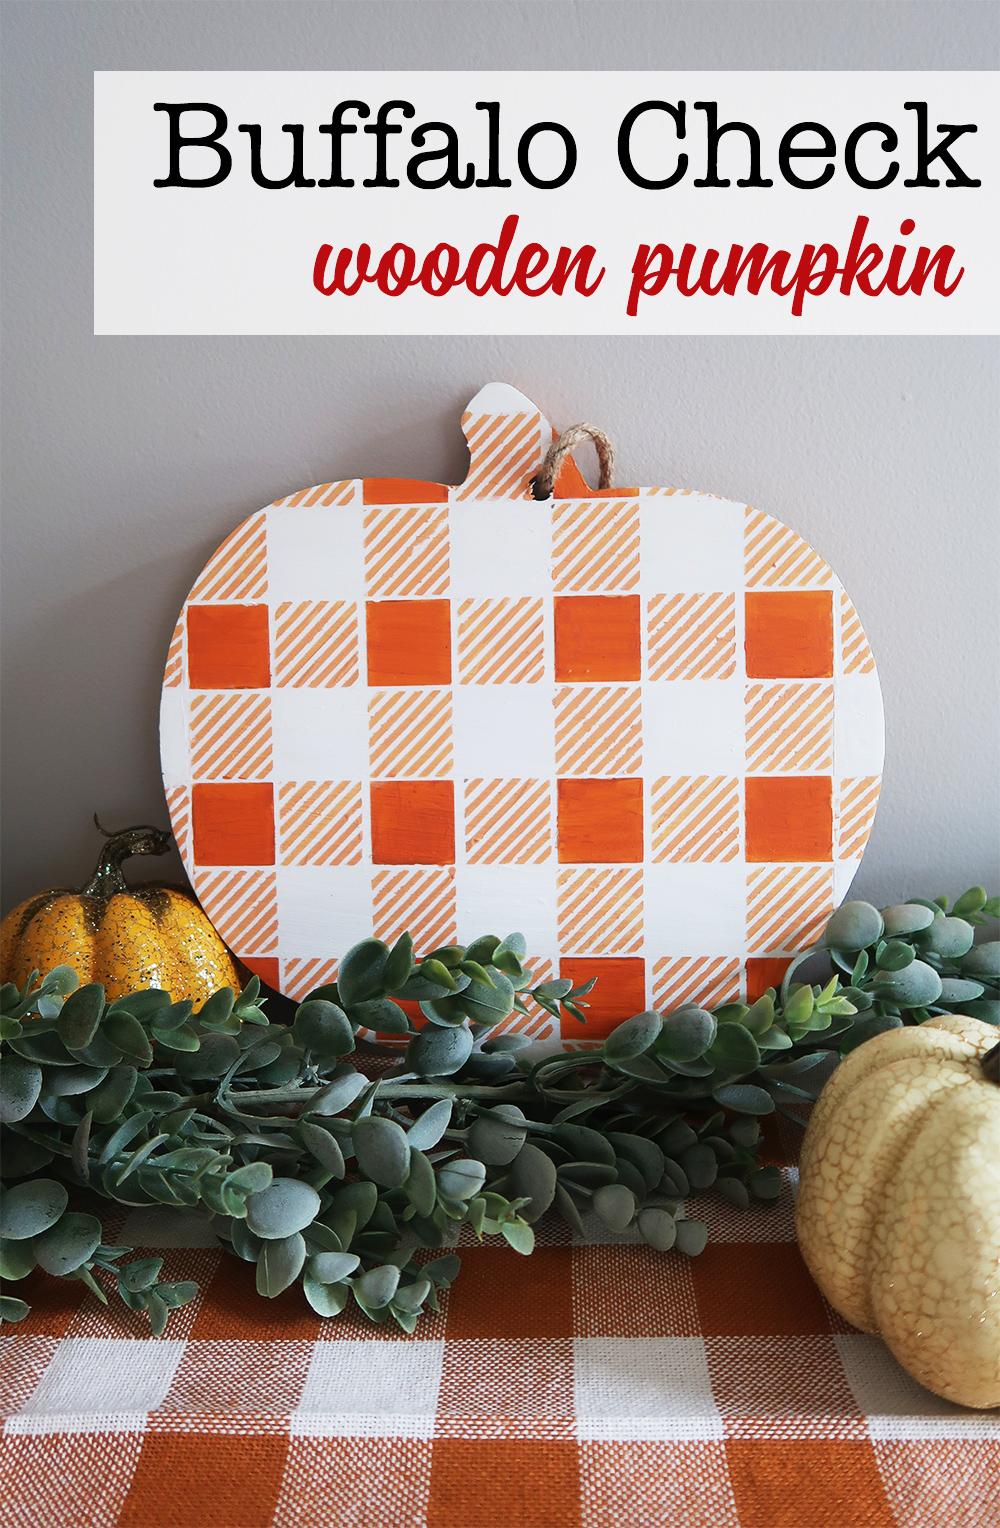 Buffalo Check Wooden Pumpkin